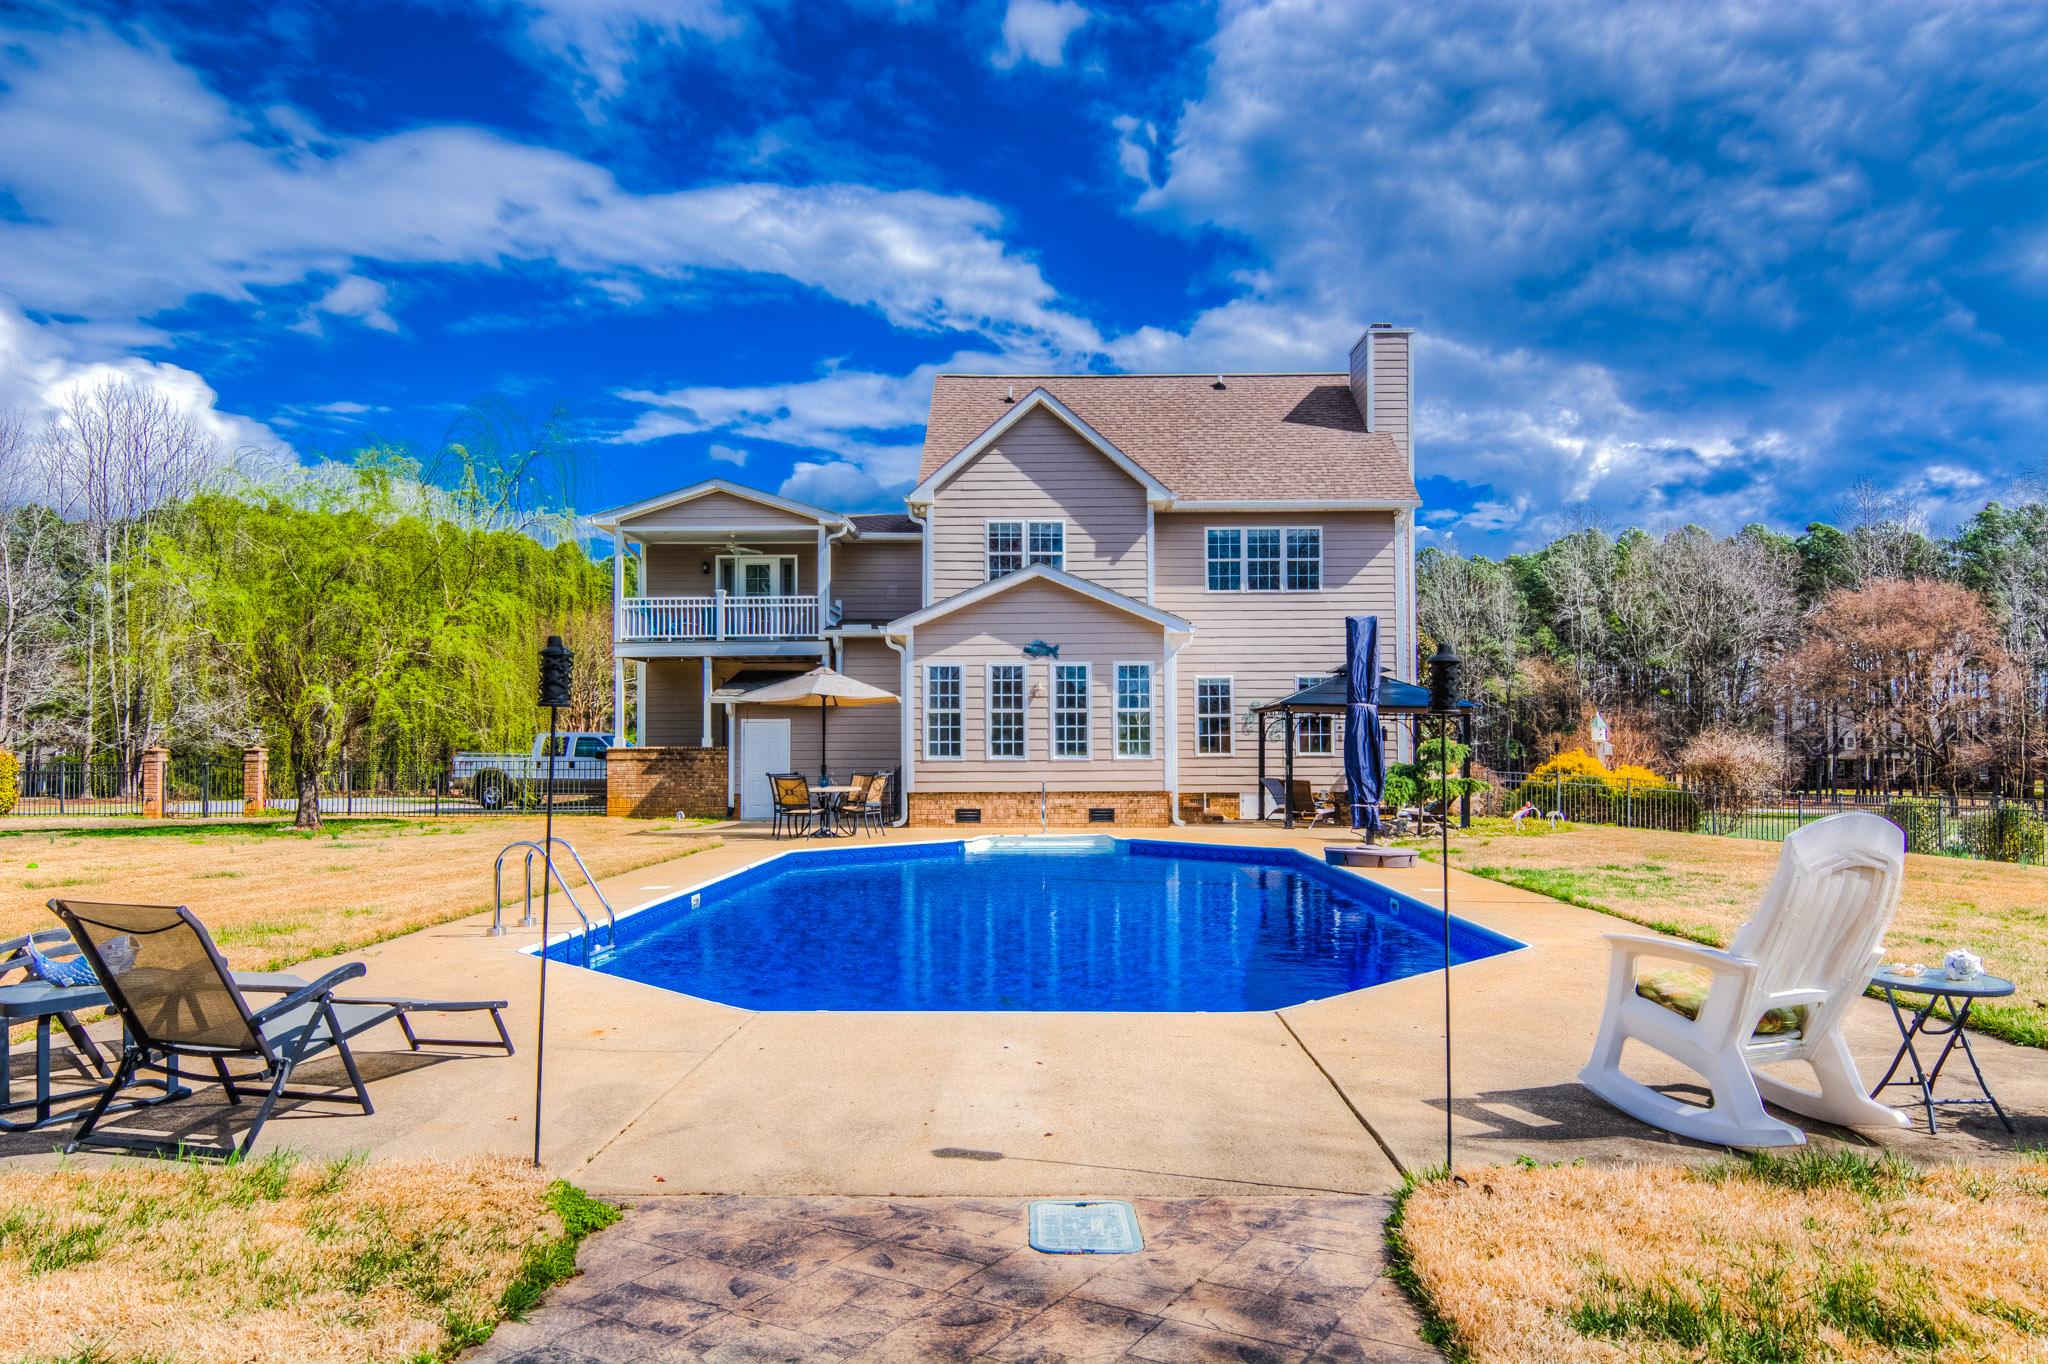 6822 Windchase Dr Goldsboro Exterior Pool